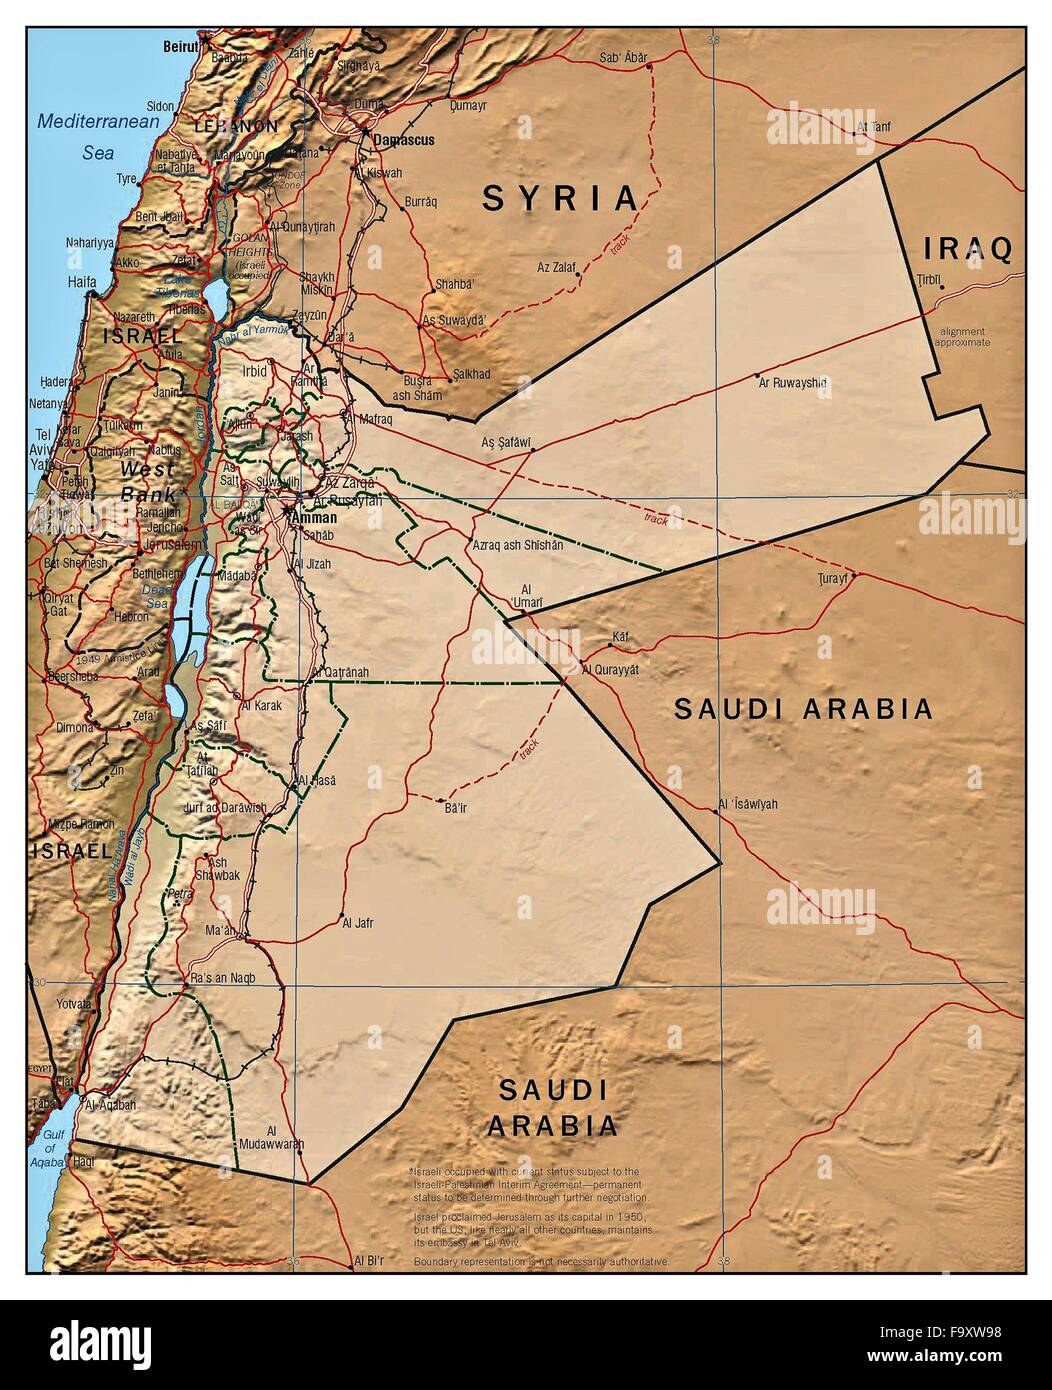 Jordan country stock photos jordan country stock images alamy jordan country physiography map stock image gumiabroncs Gallery